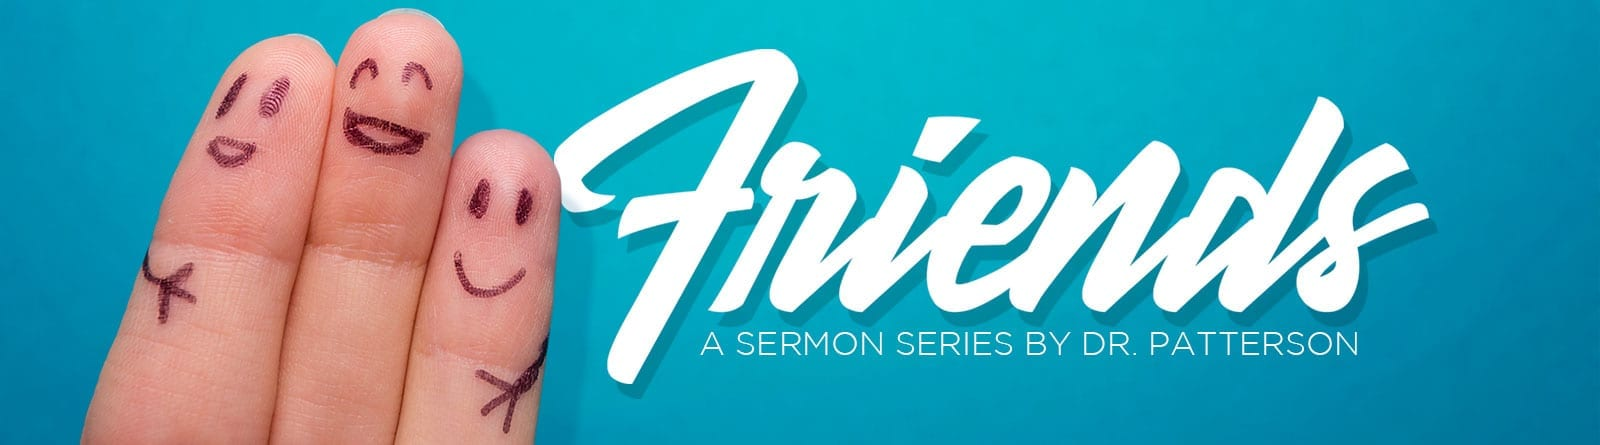 Friends-Sermon-Series-1600×445